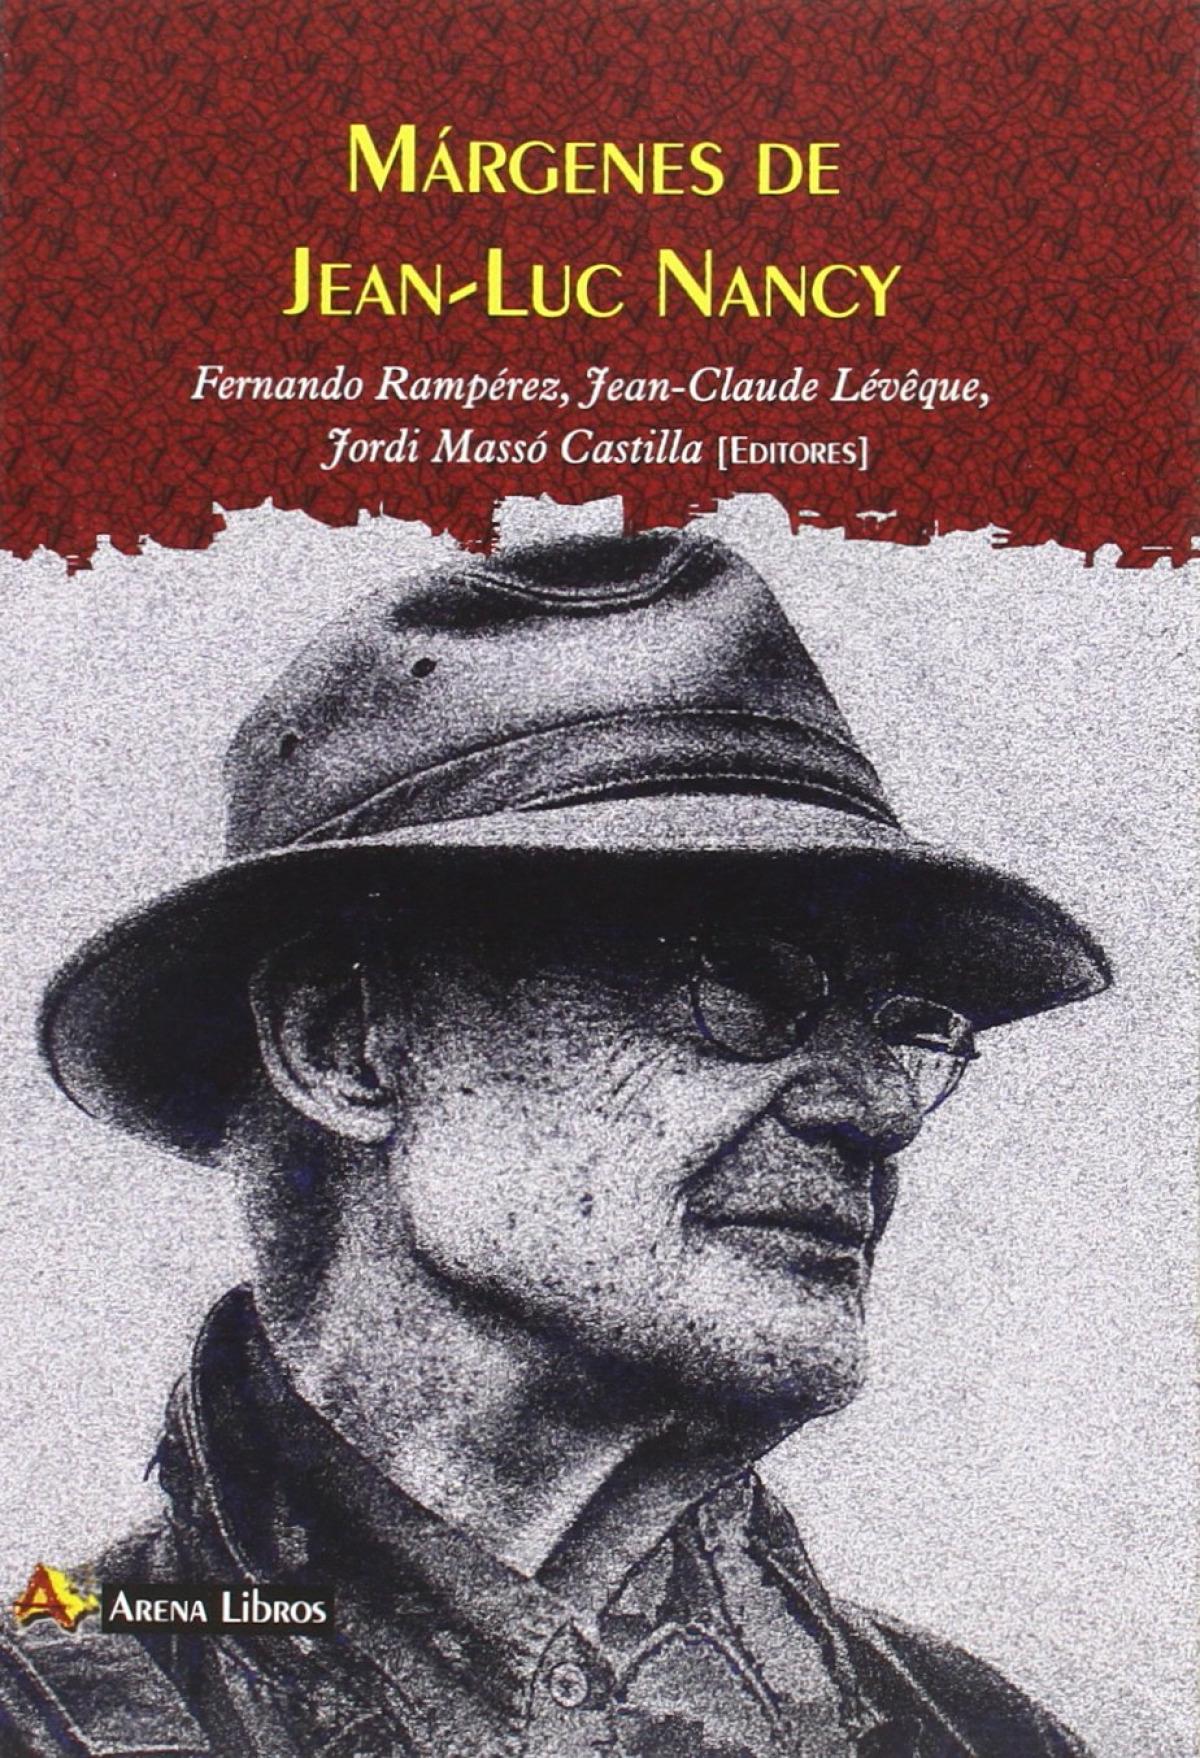 Márgenes de Jean-Luc Nancy